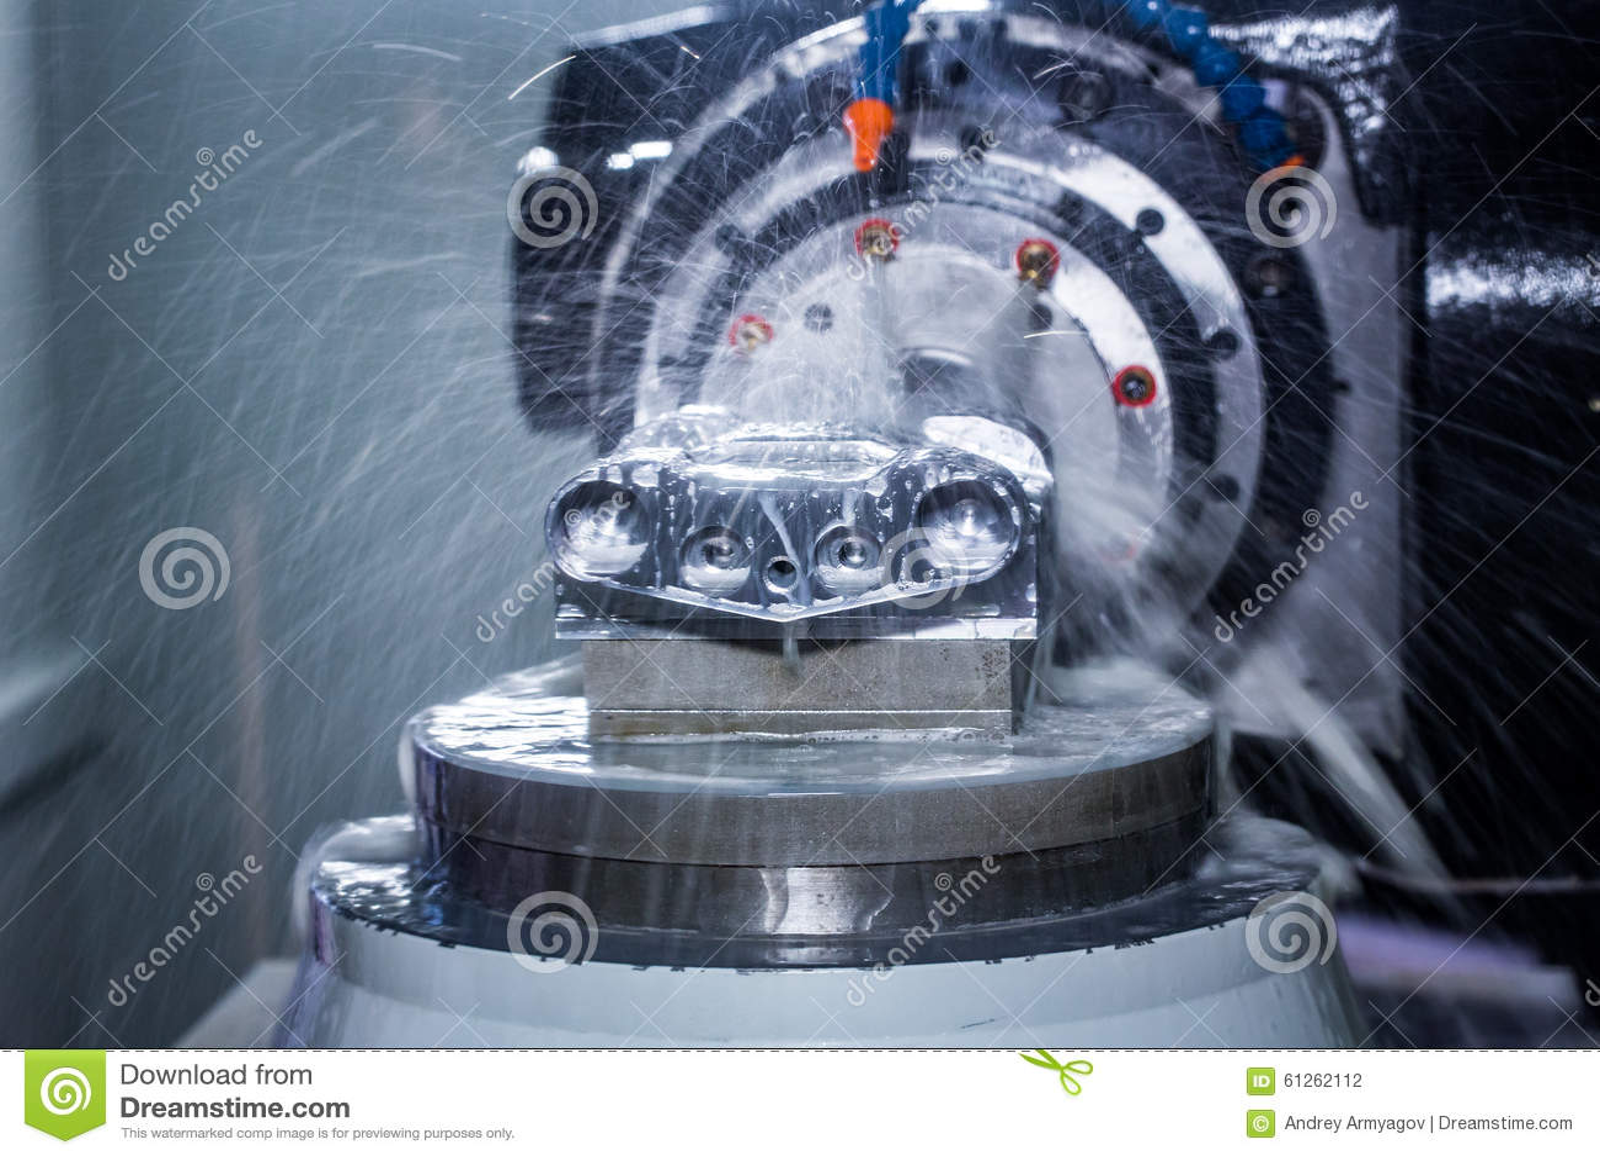 Metalworking Cnc Milling Machine Stock Photo Image